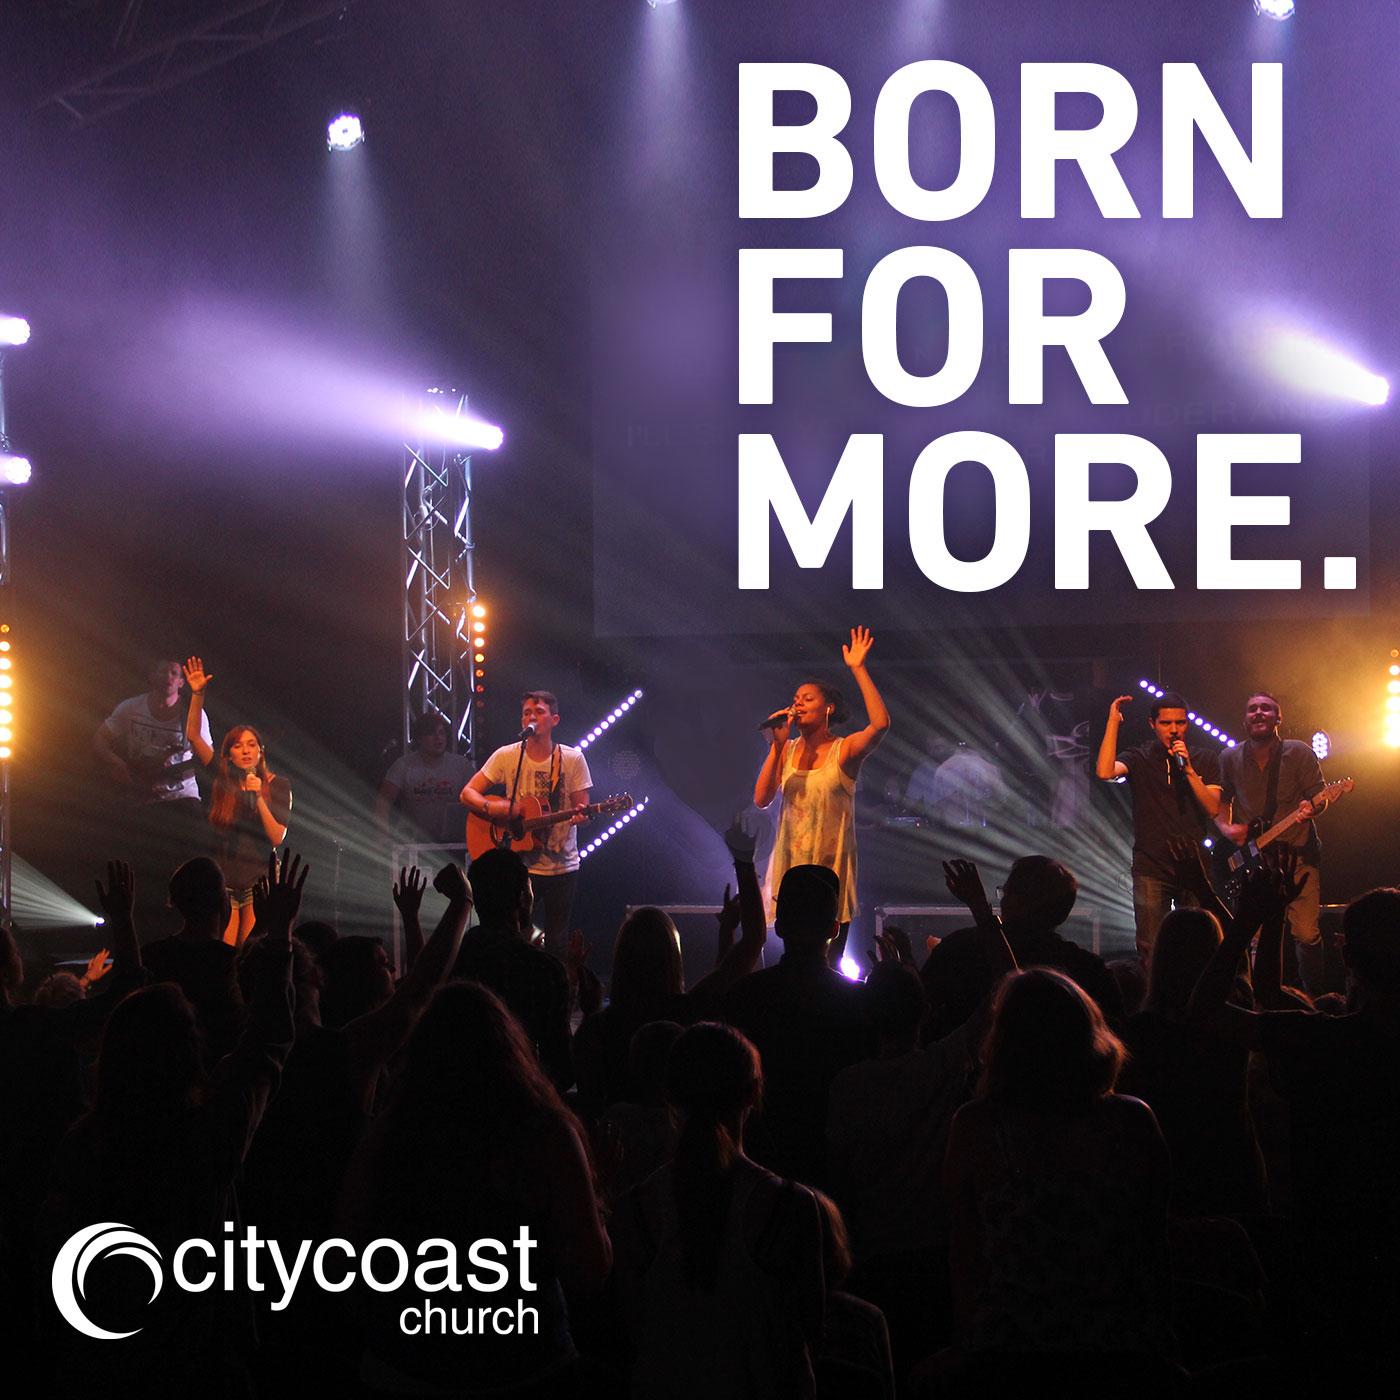 CityCoast Podcast